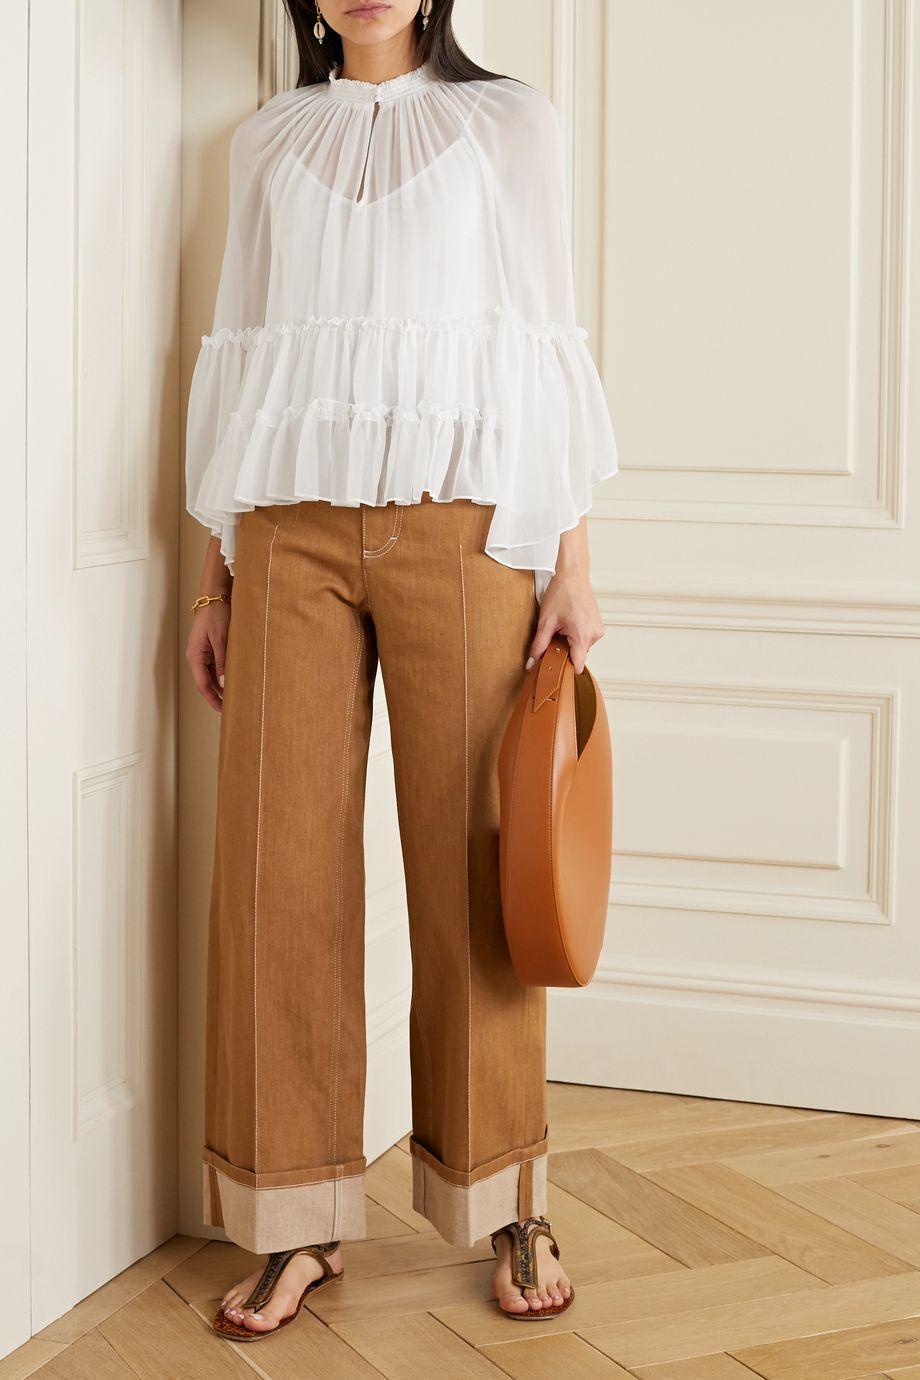 Alice + Olivia Lanita ruffled chiffon blouse